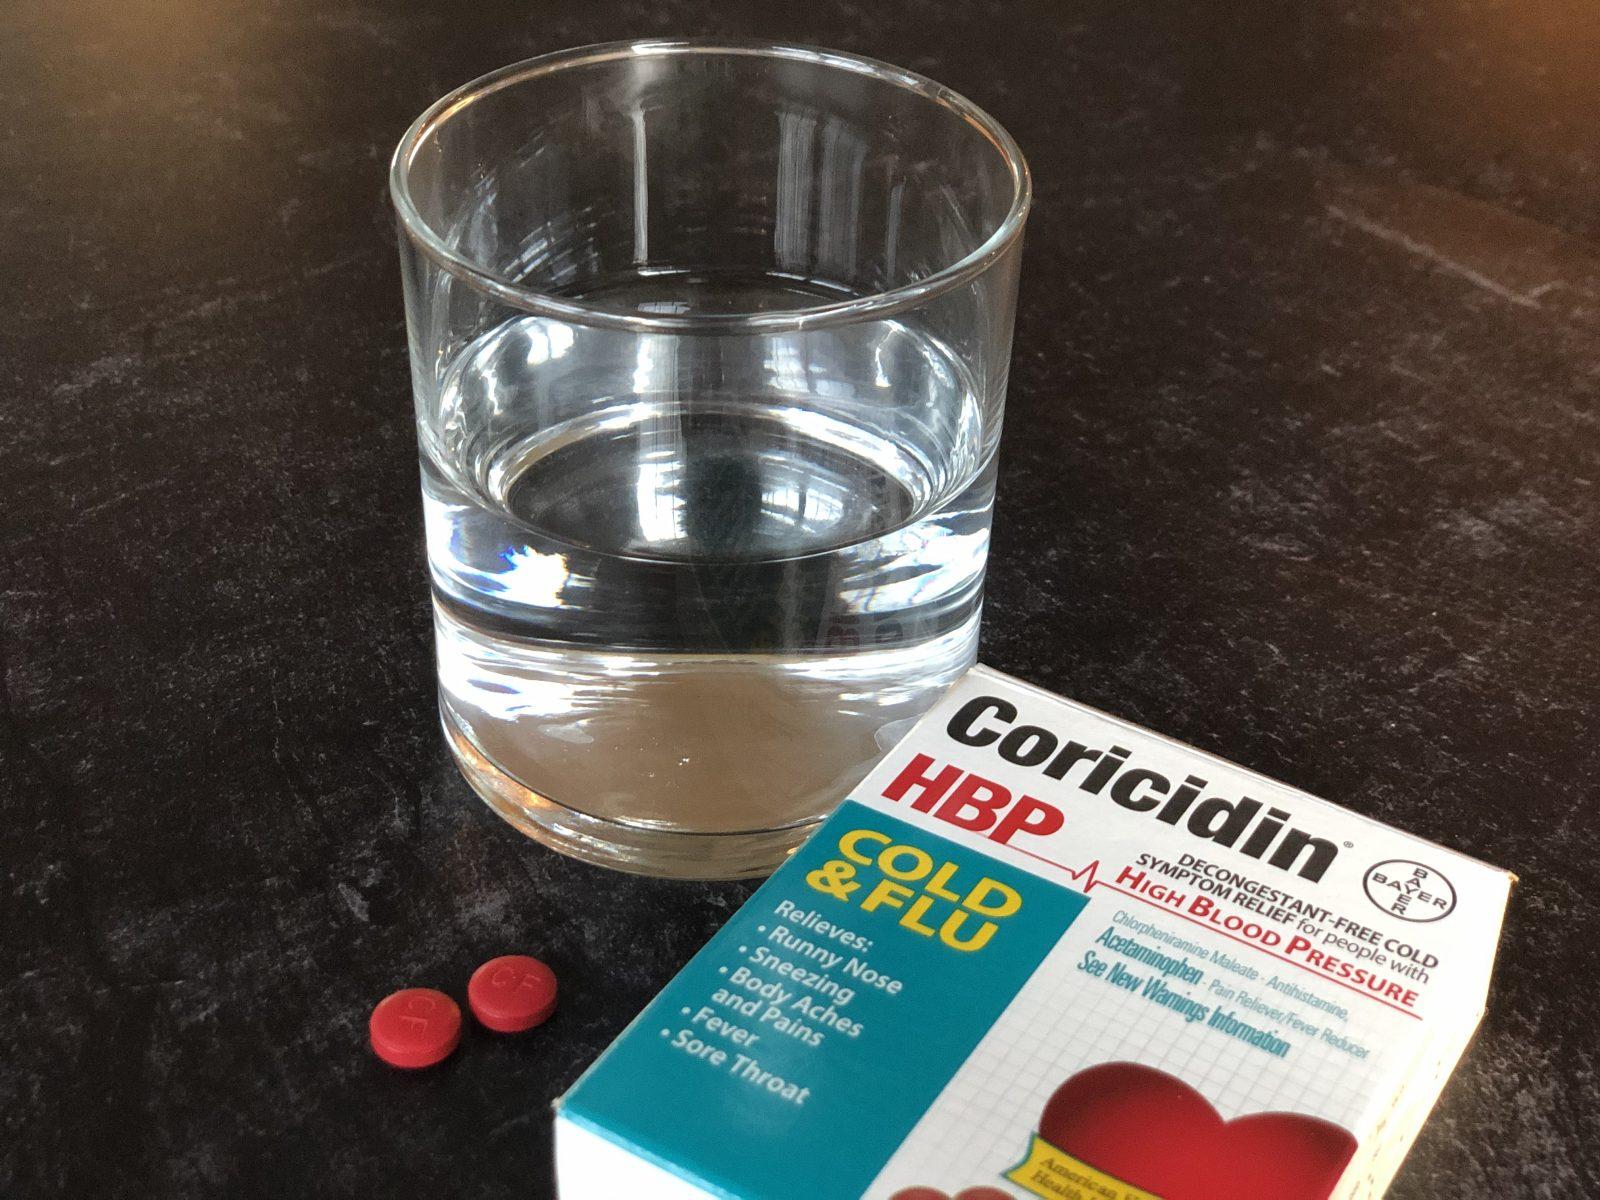 Coricidin Just $2.39 At Publix (reg $7.99) on I Heart Publix